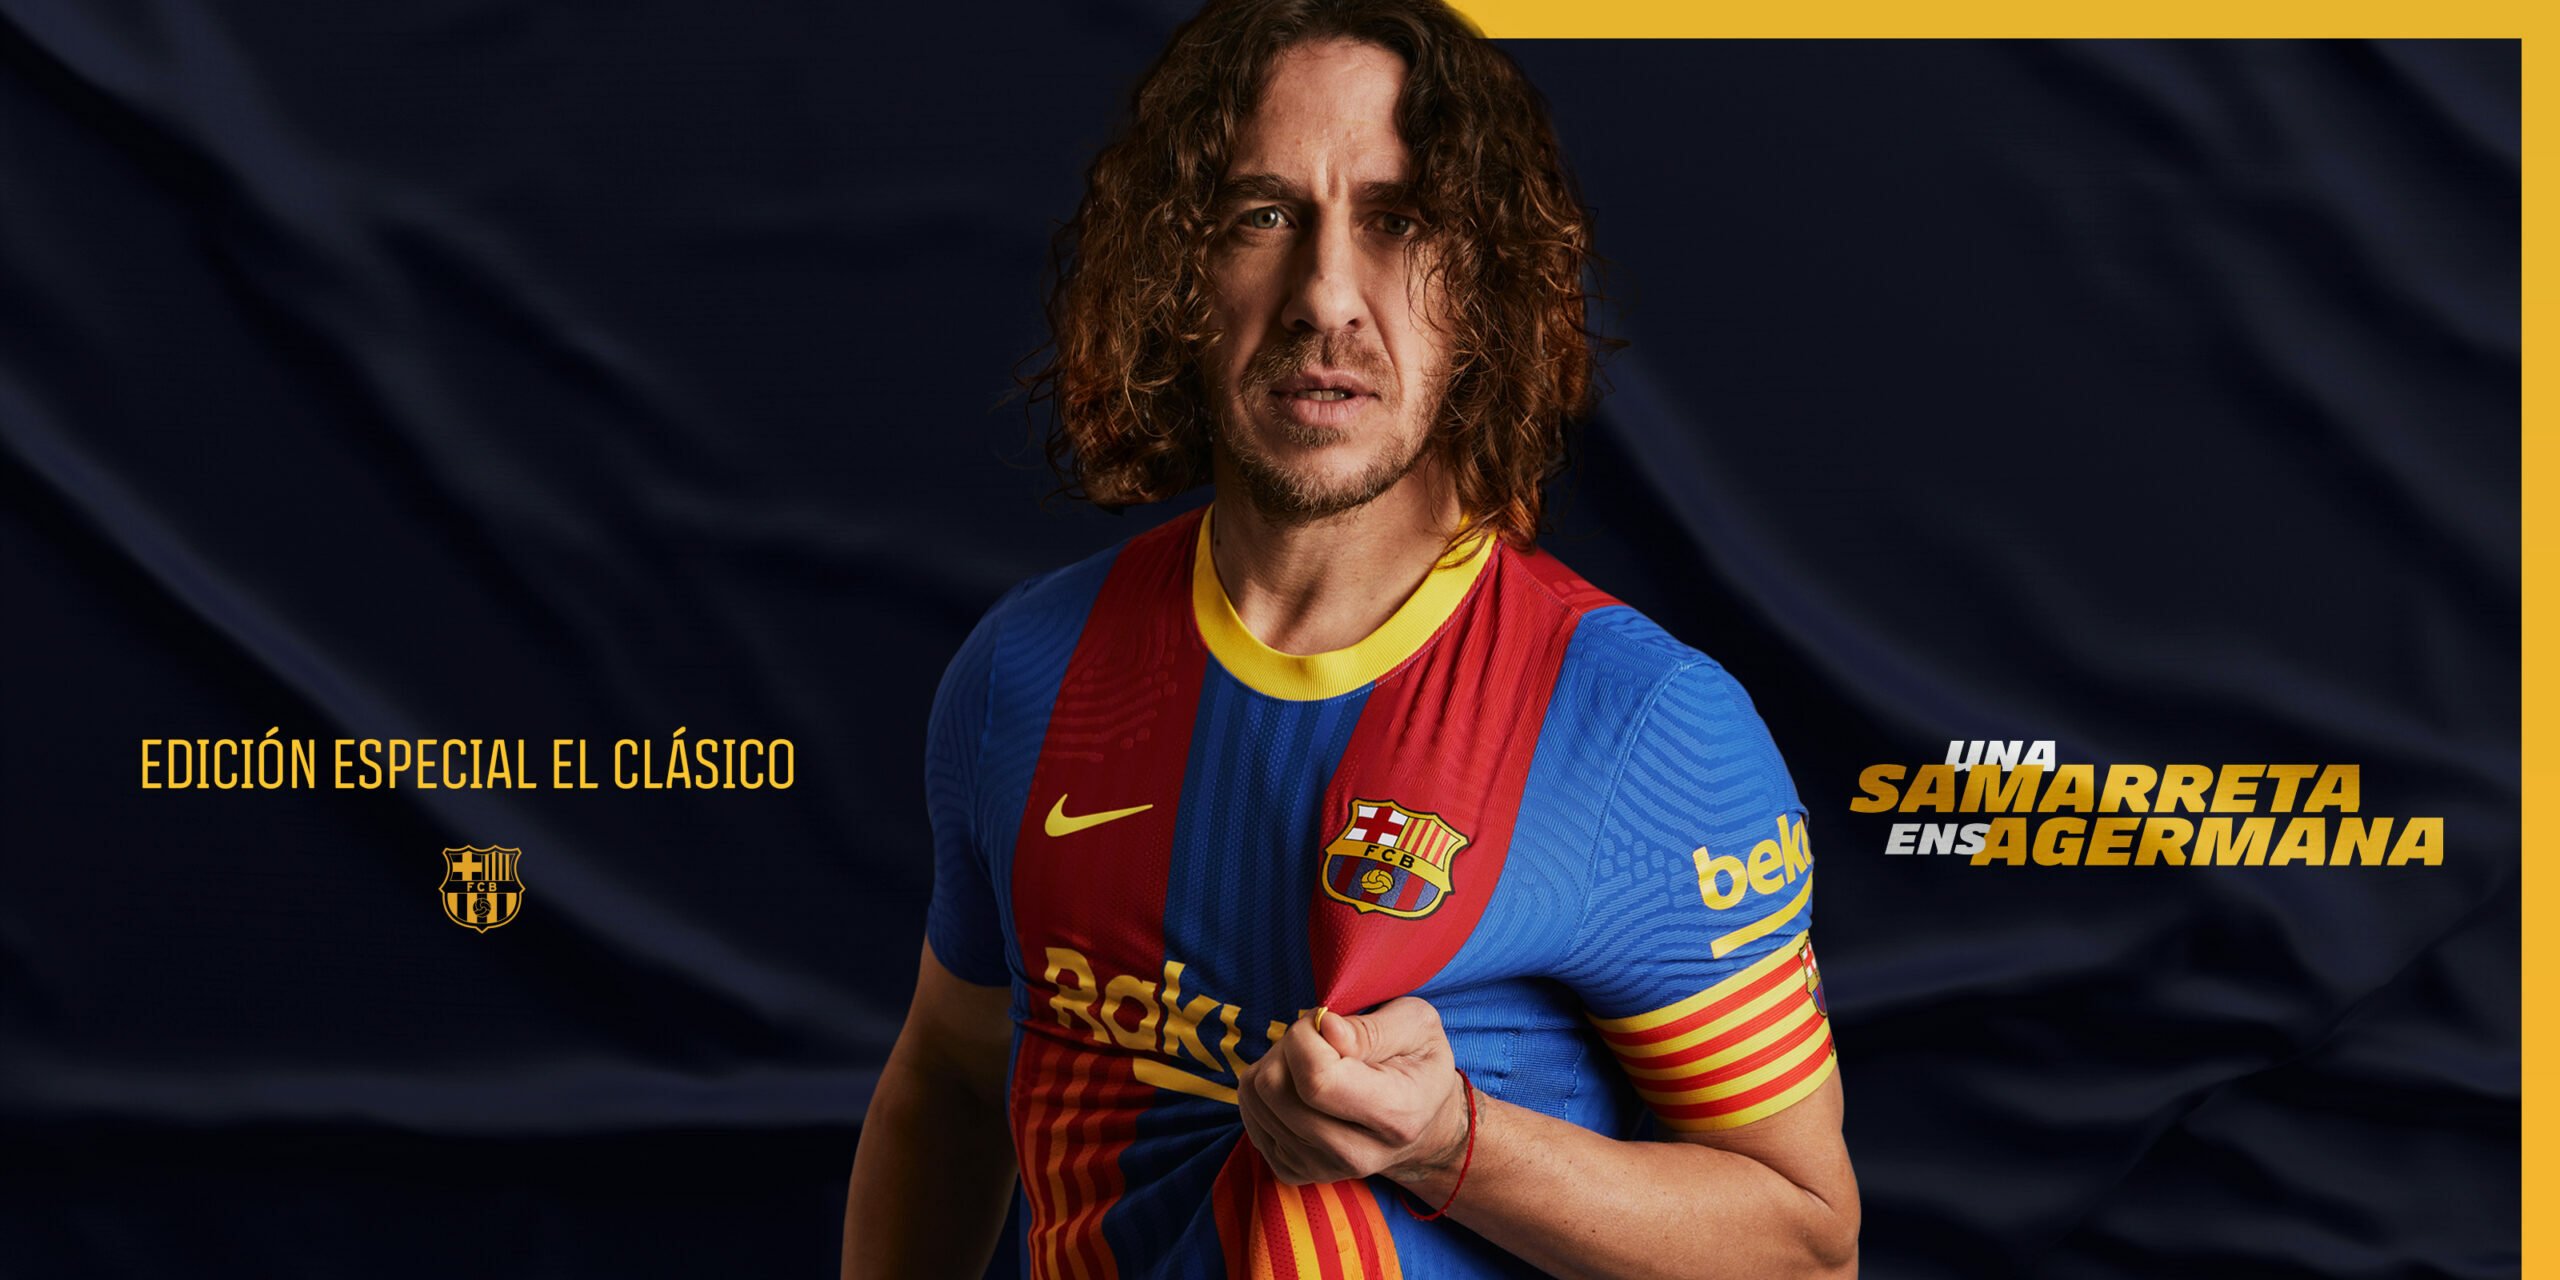 Carles Puyol presenta la nova samarreta del Barça |FC Barcelona